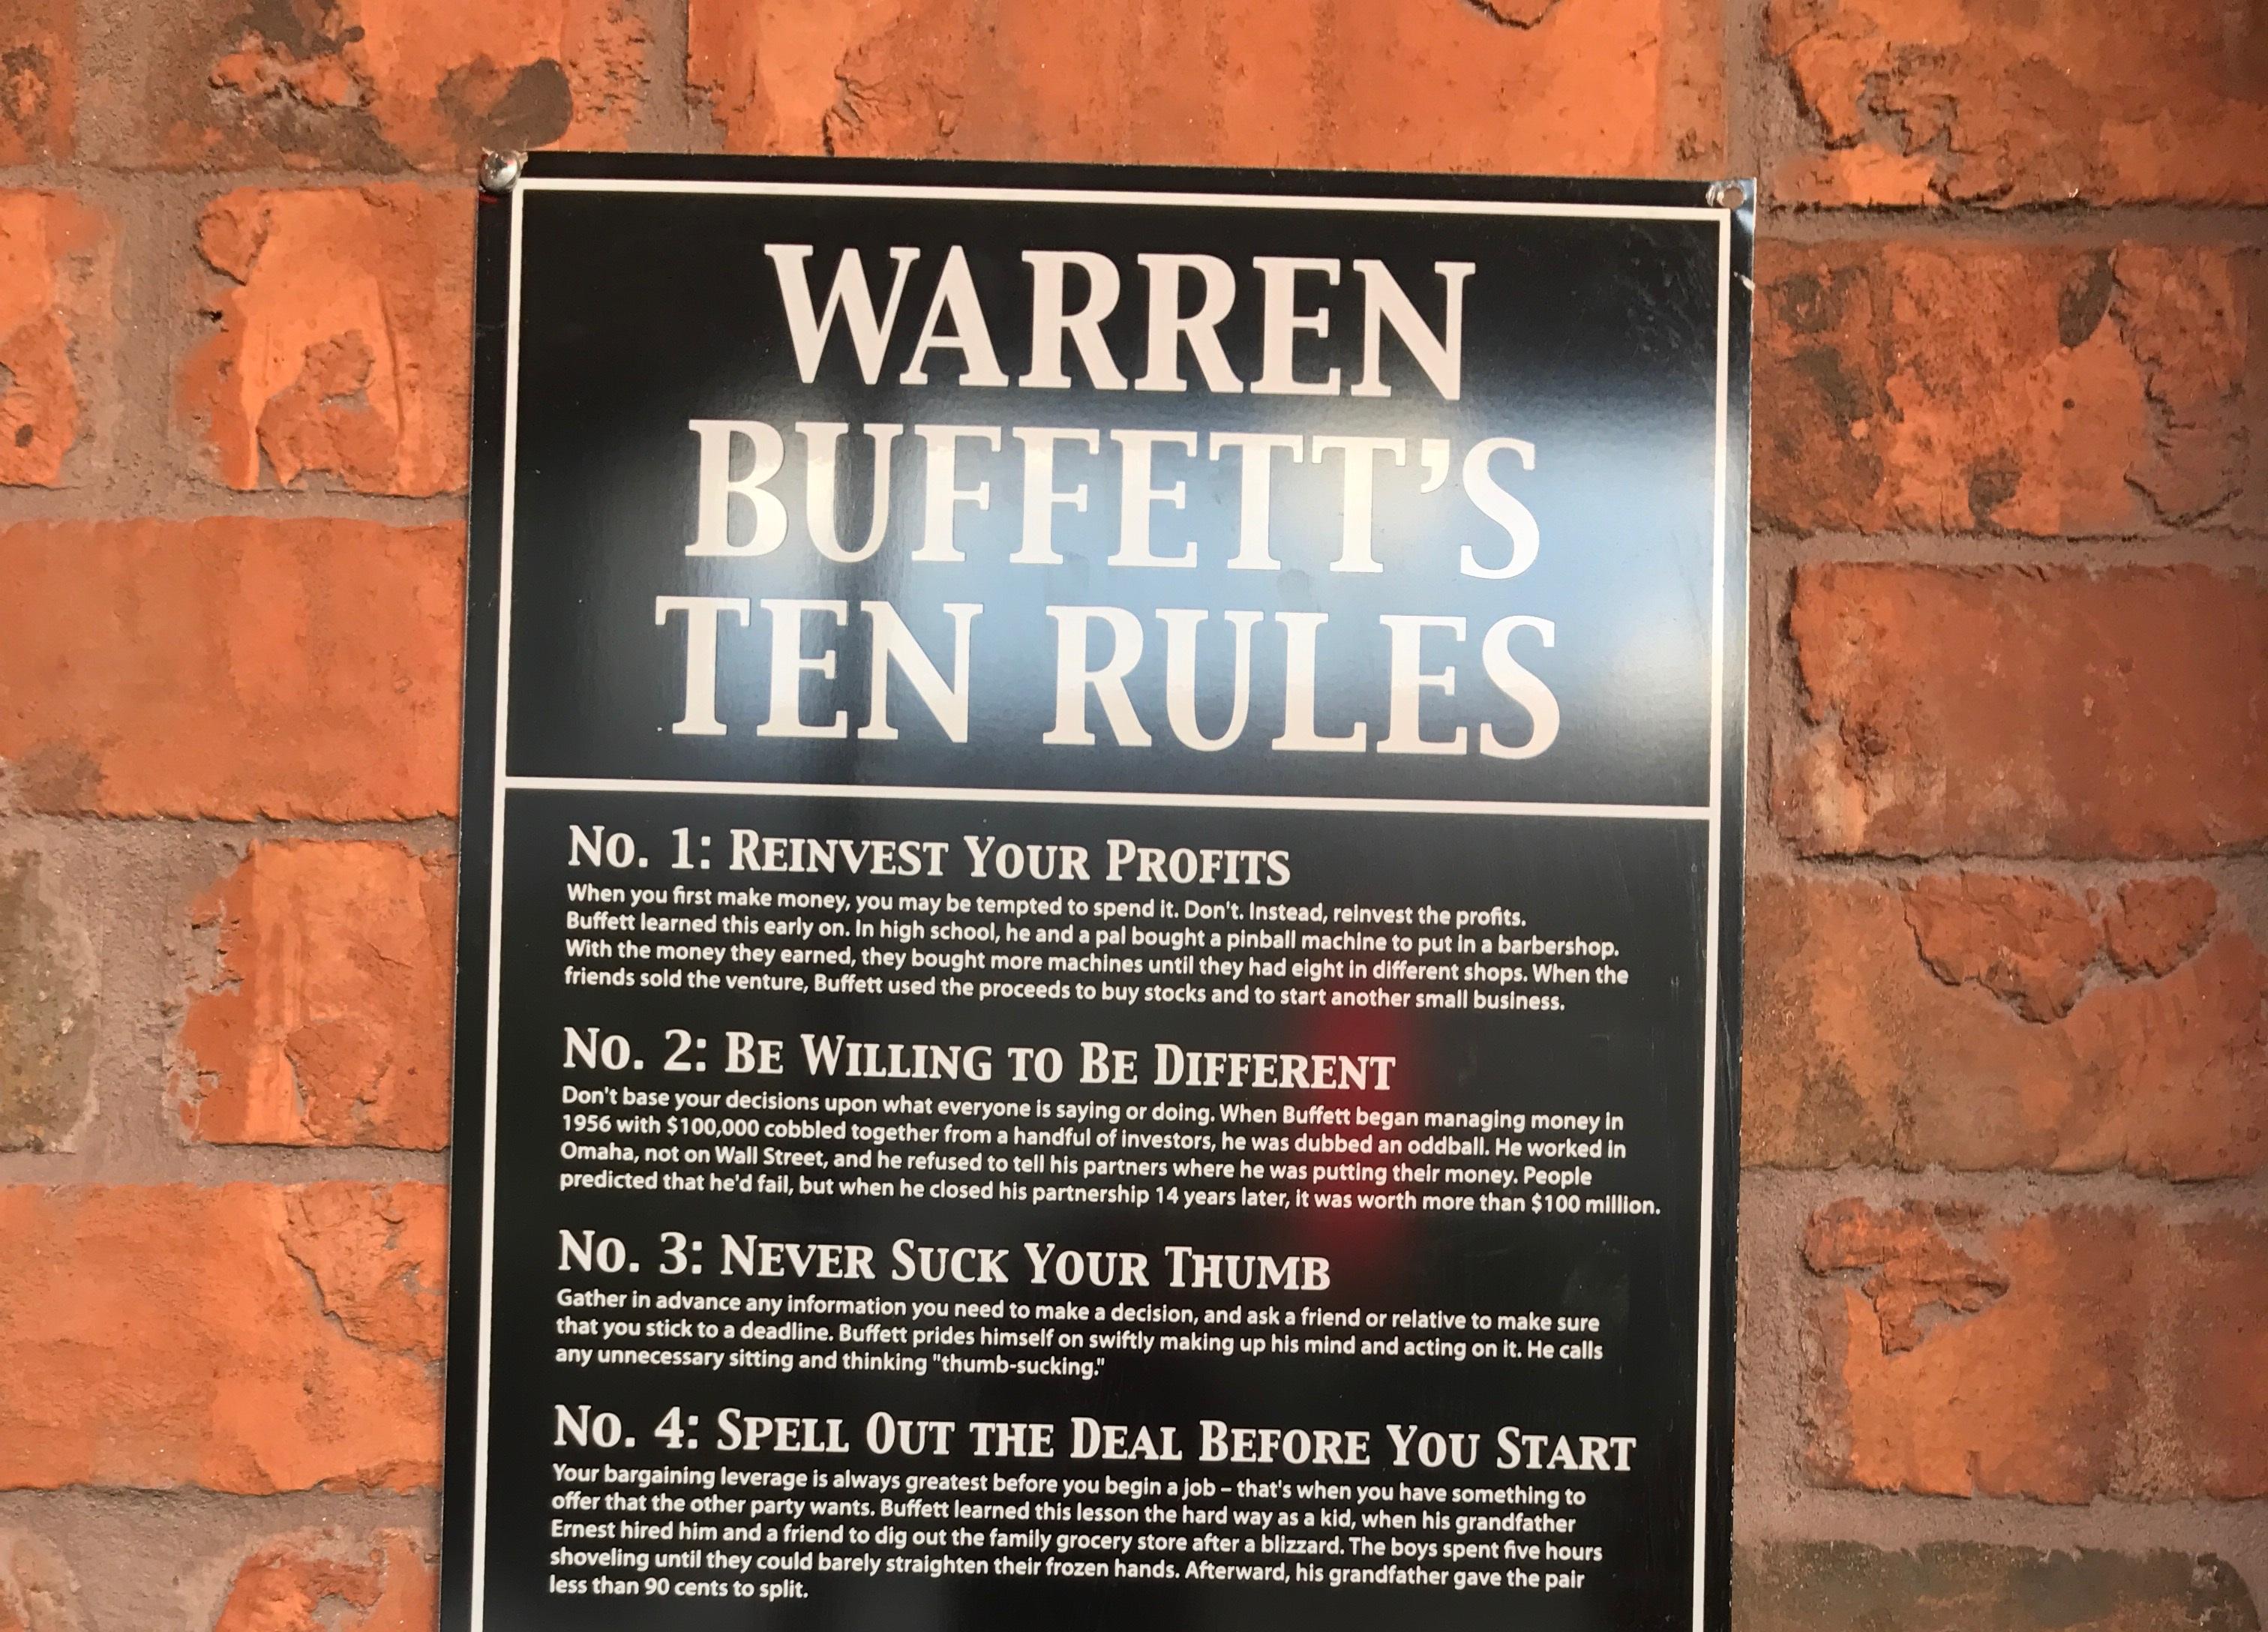 buffetts bites the essential investors guide to warren buffetts shareholder letters